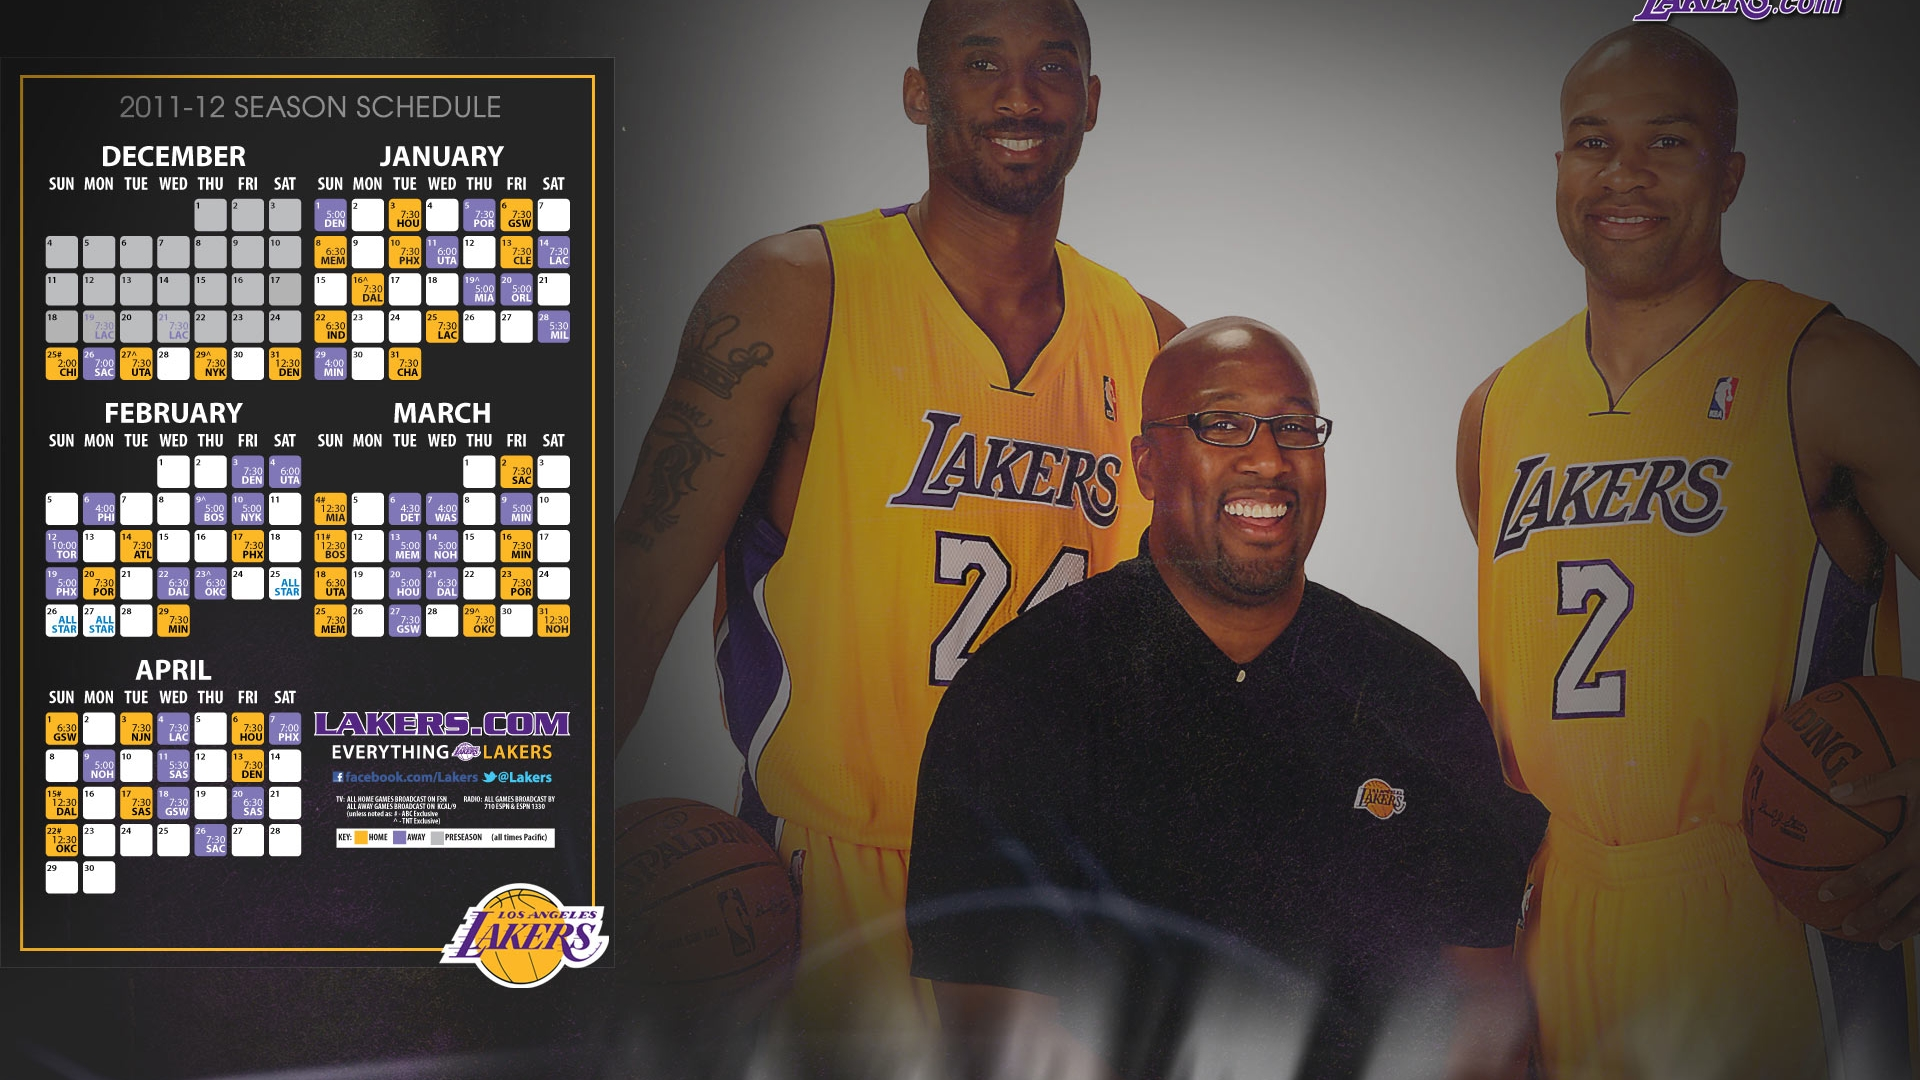 LA Lakers 2012 Schedule